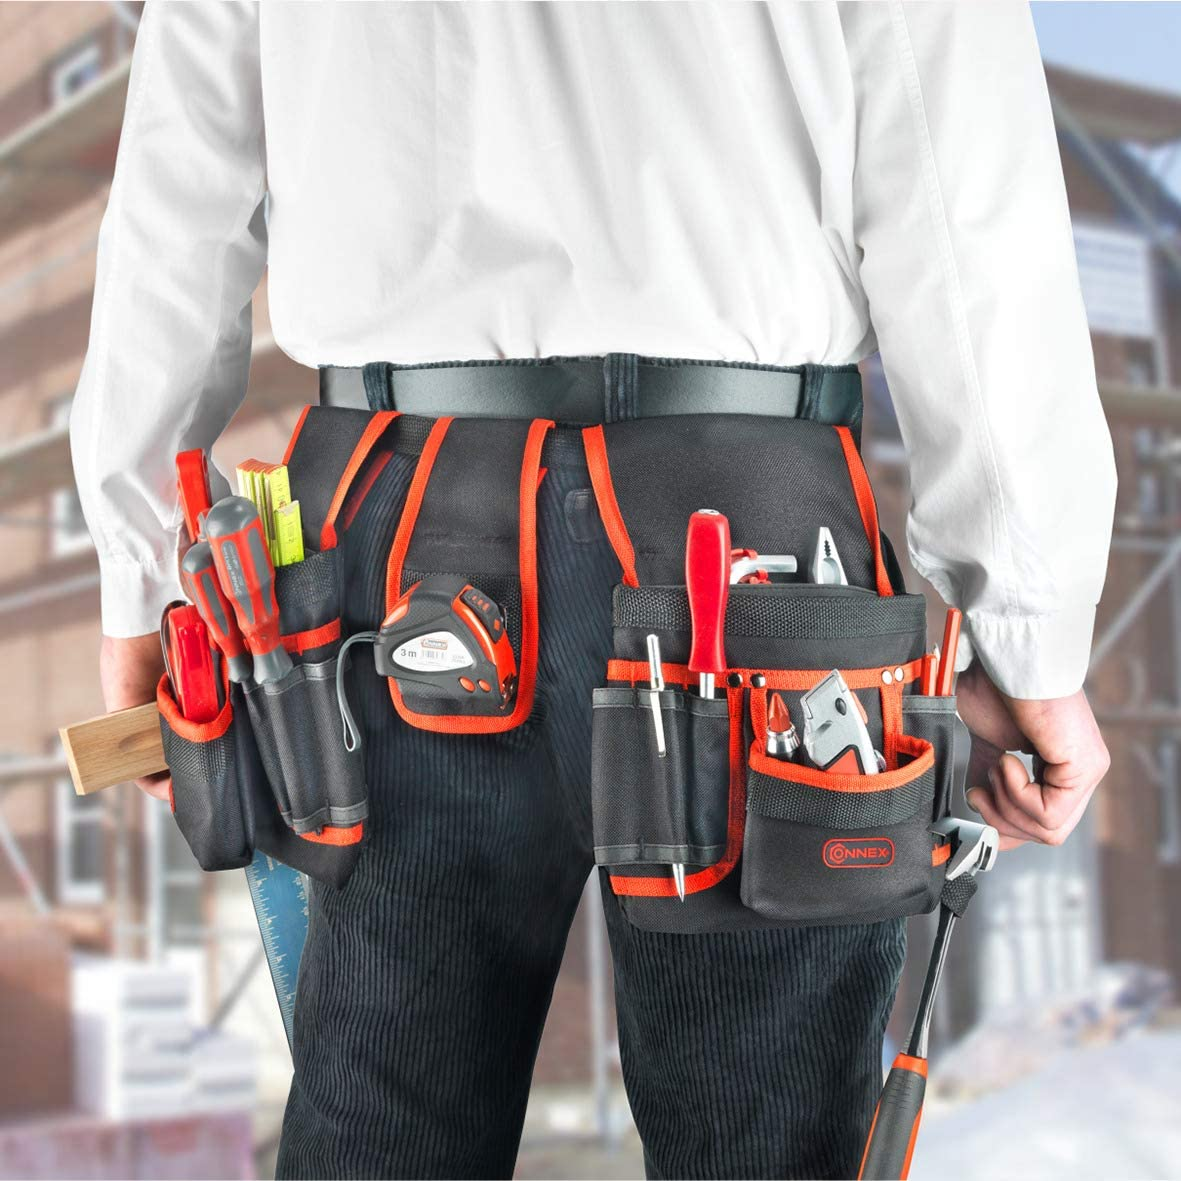 Connex COX952056 Tool Belt